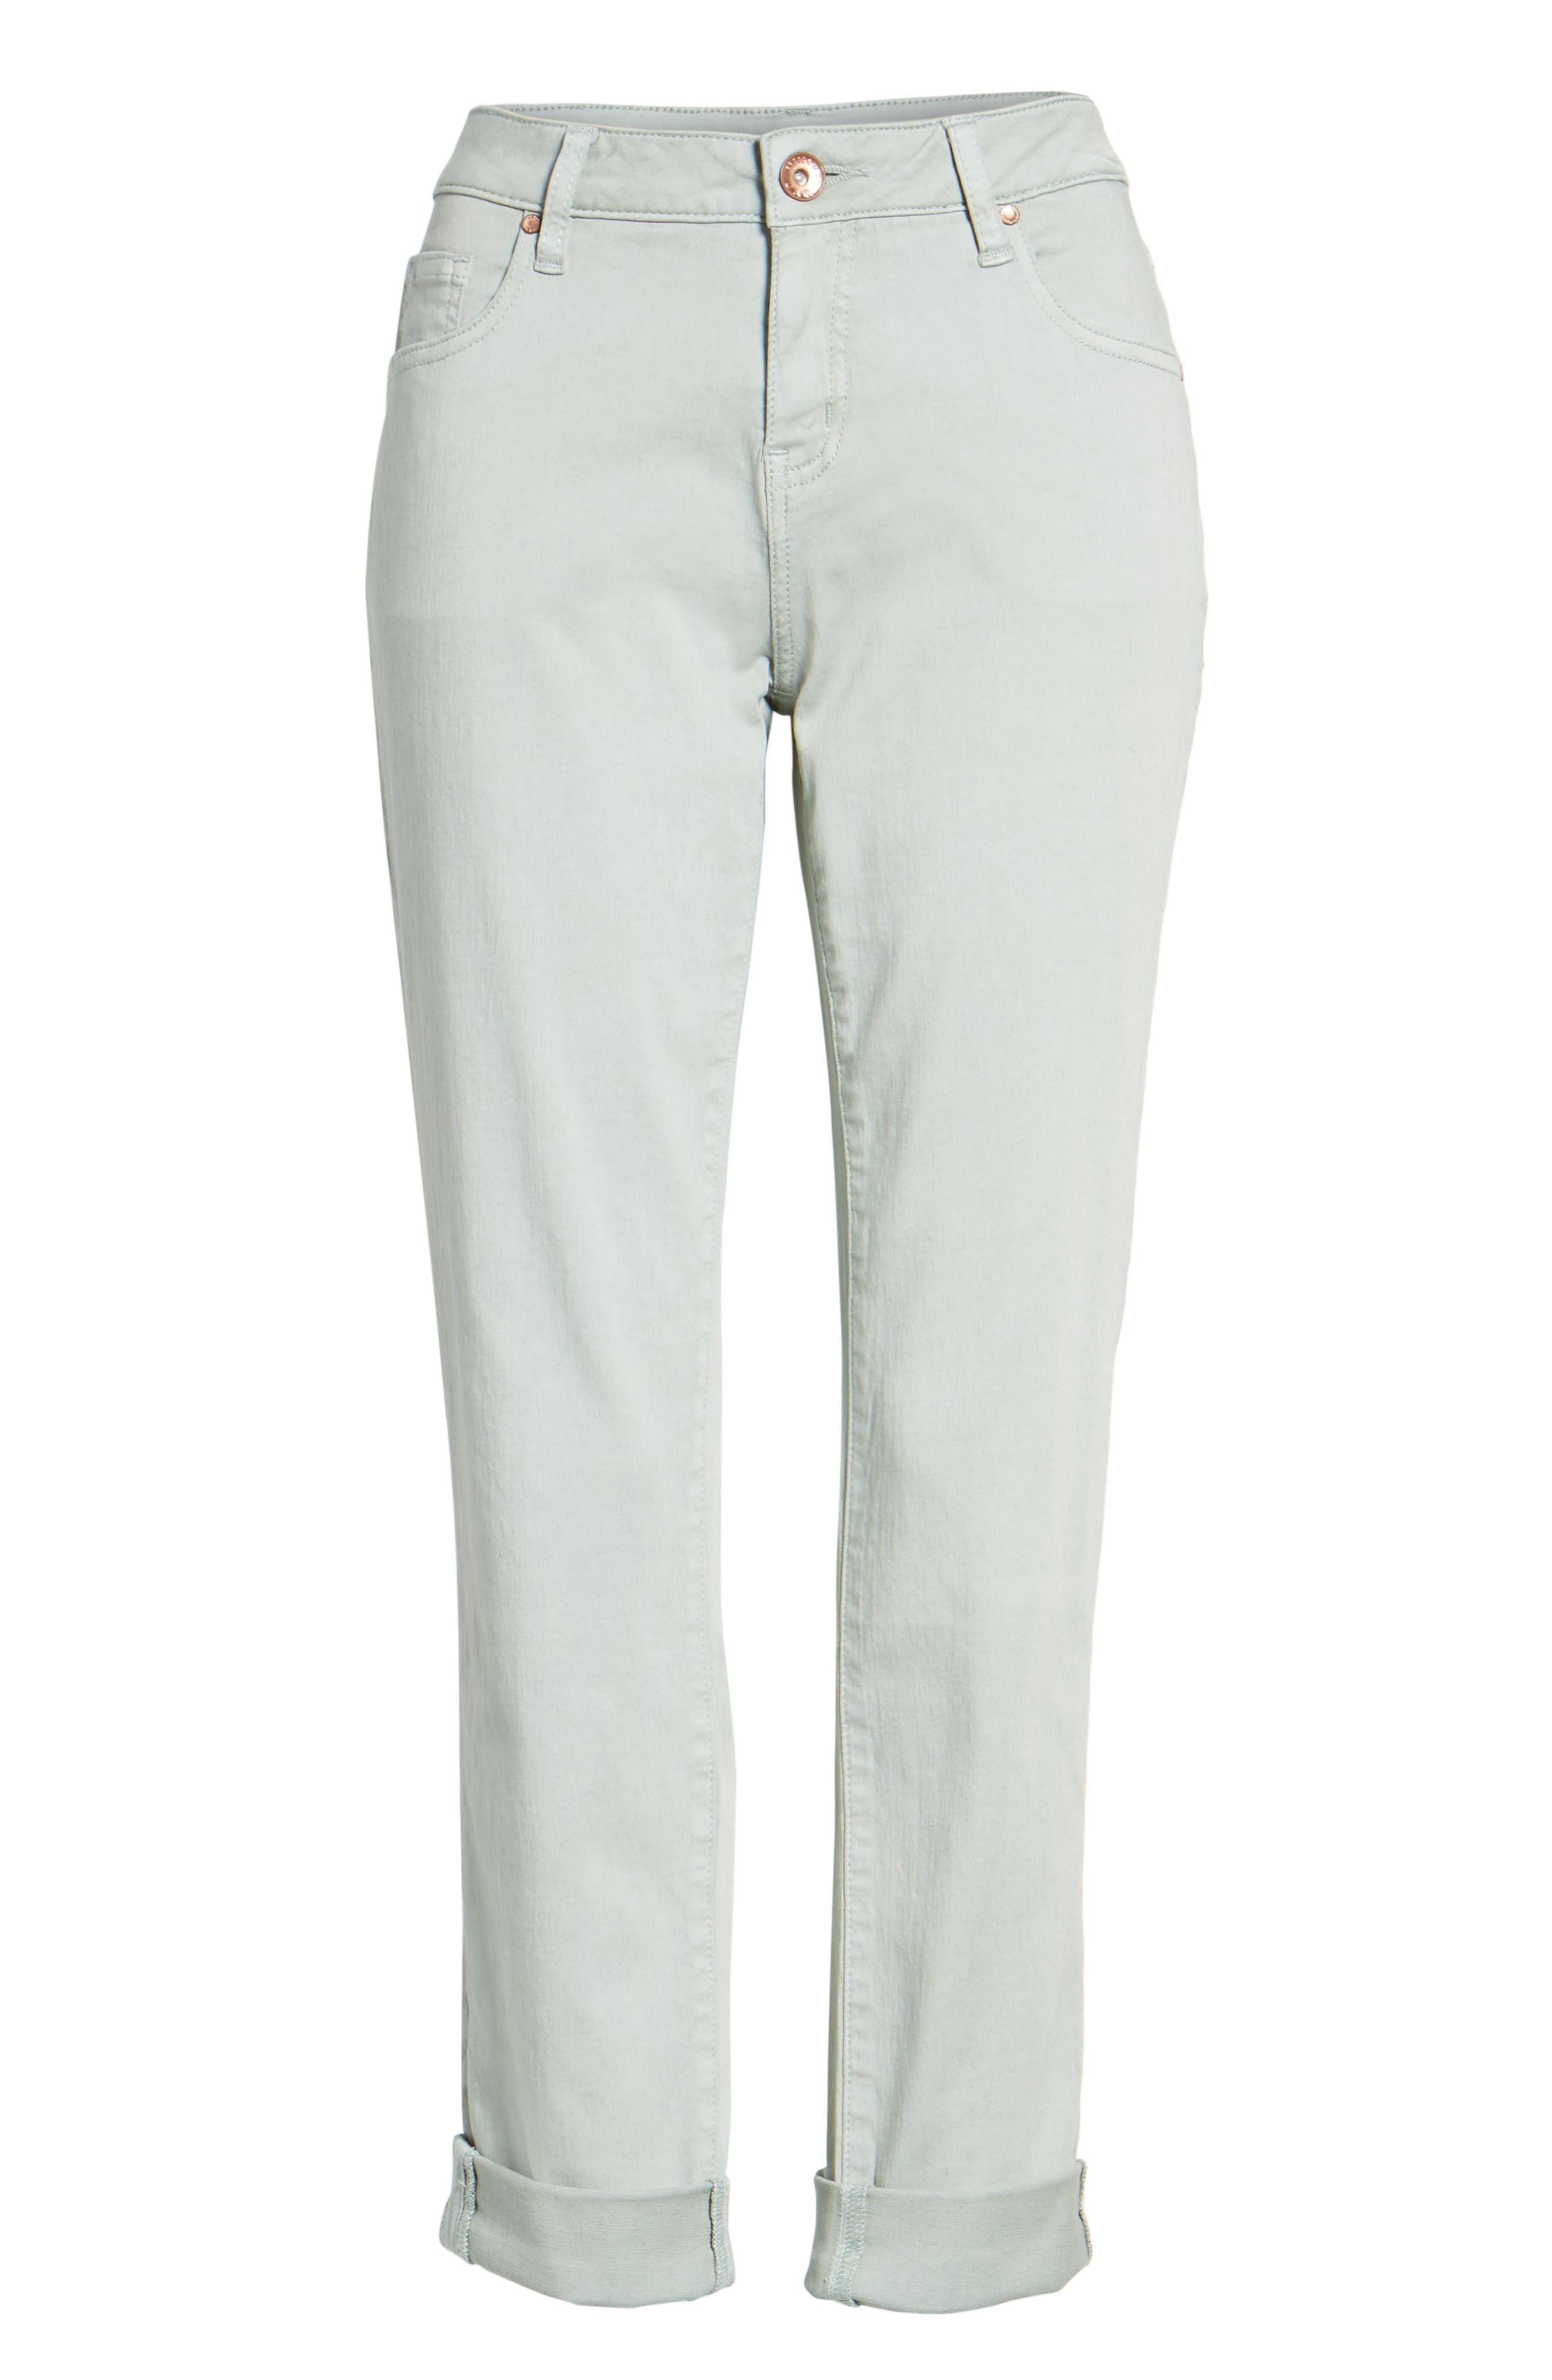 Carter Knit Denim Girlfriend Jeans,                             Alternate thumbnail 6, color,                             Beach Glass